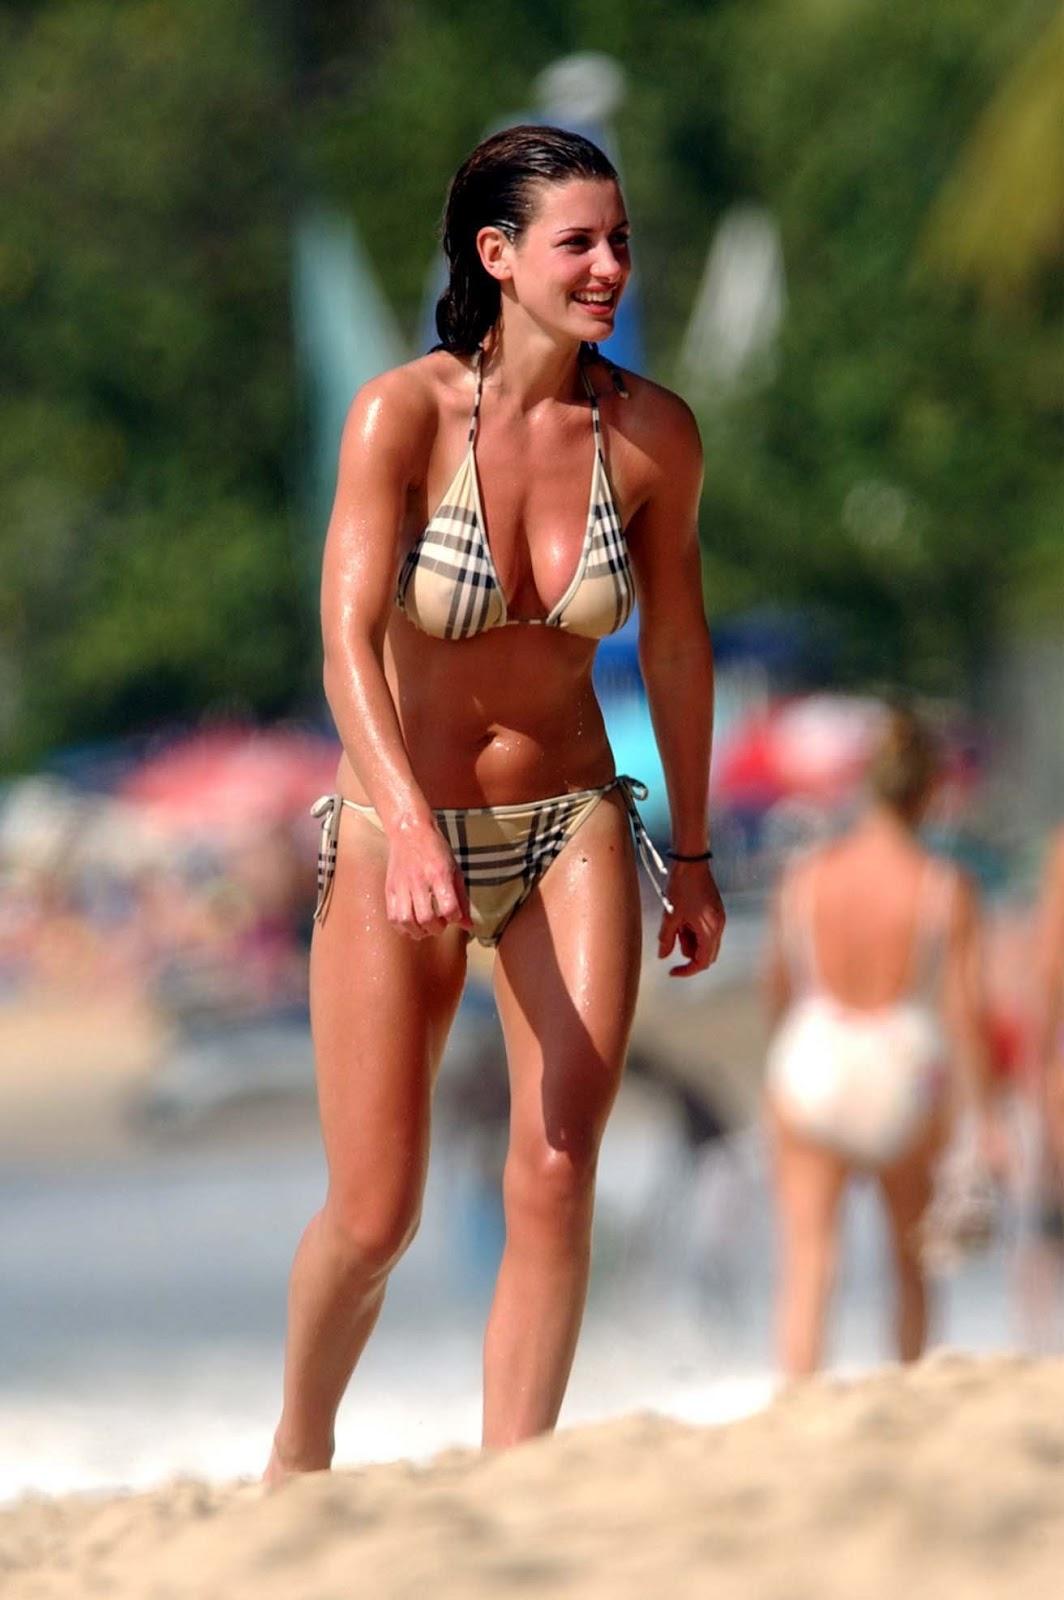 Kirsty gallacher topless